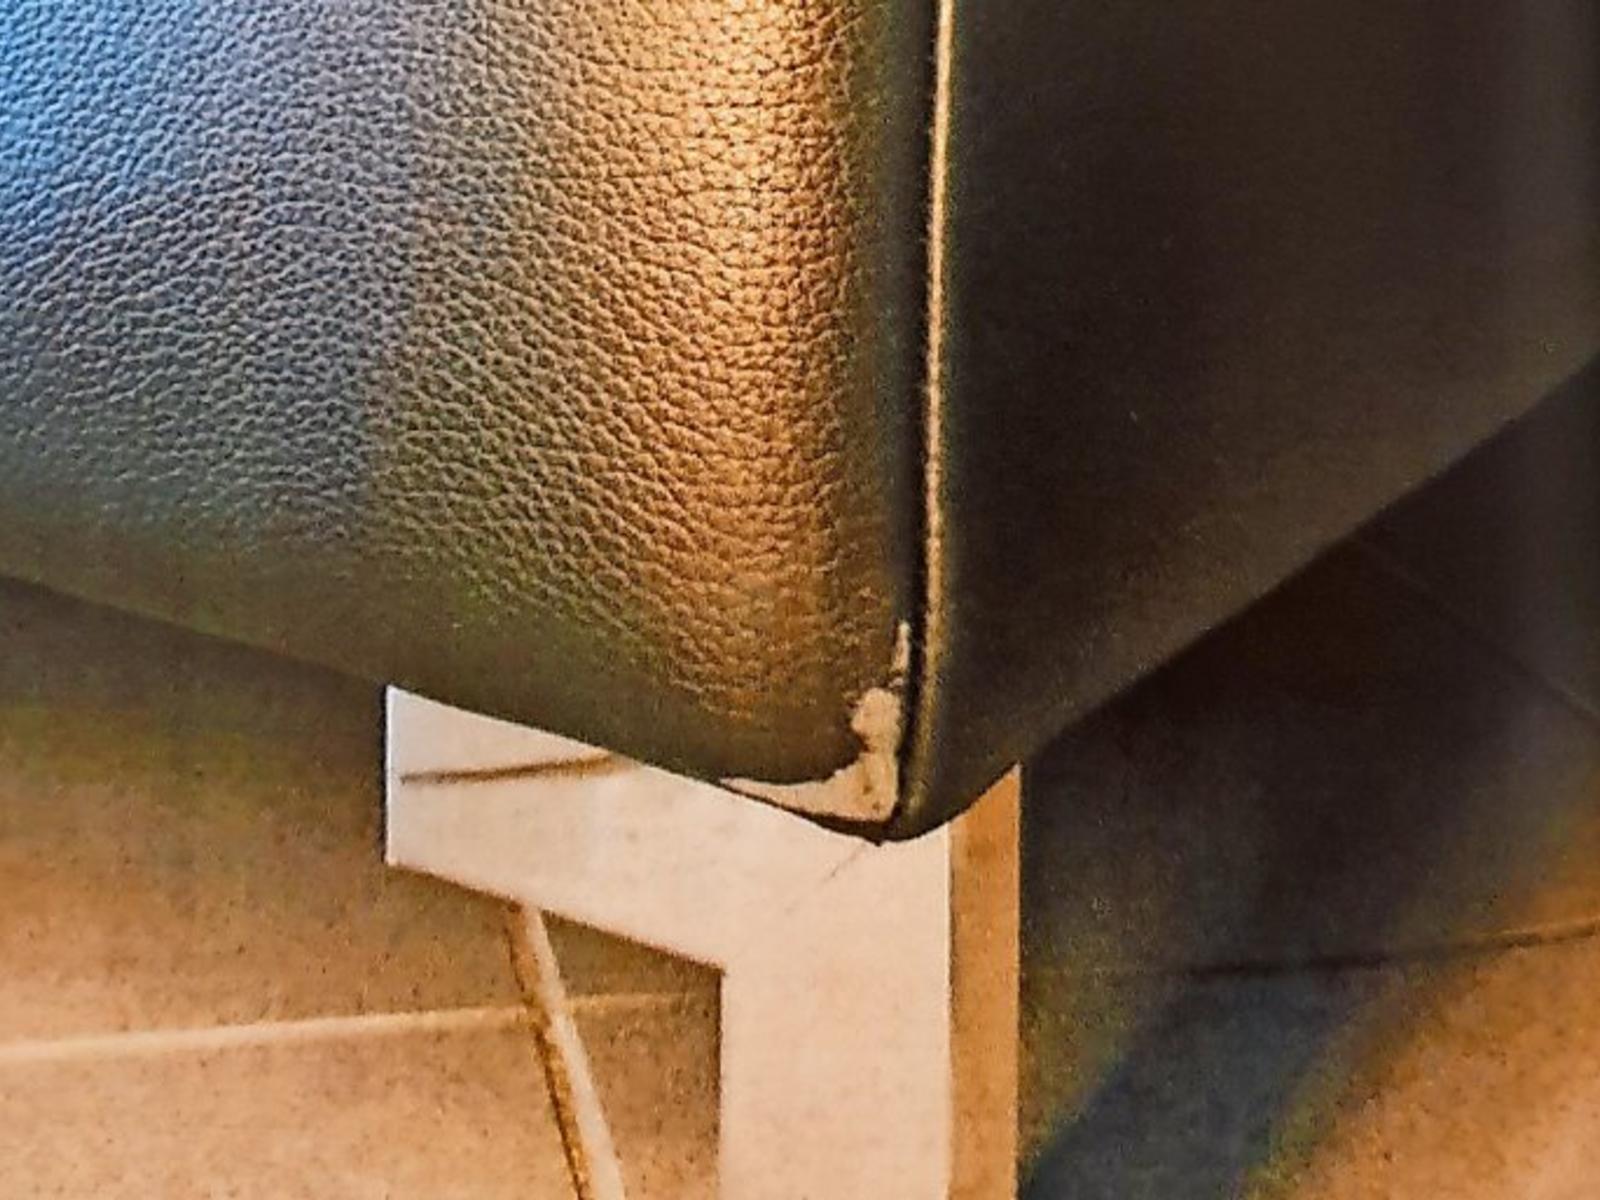 Full Size of Amtsgericht Hannover Kundin Verklagt Mbelhaus Wegen Macken An Sofa Wohnlandschaft Comfortmaster Online Kaufen W Schillig Billig Große Kissen 3 Sitzer Grau Sofa Sofa Hannover